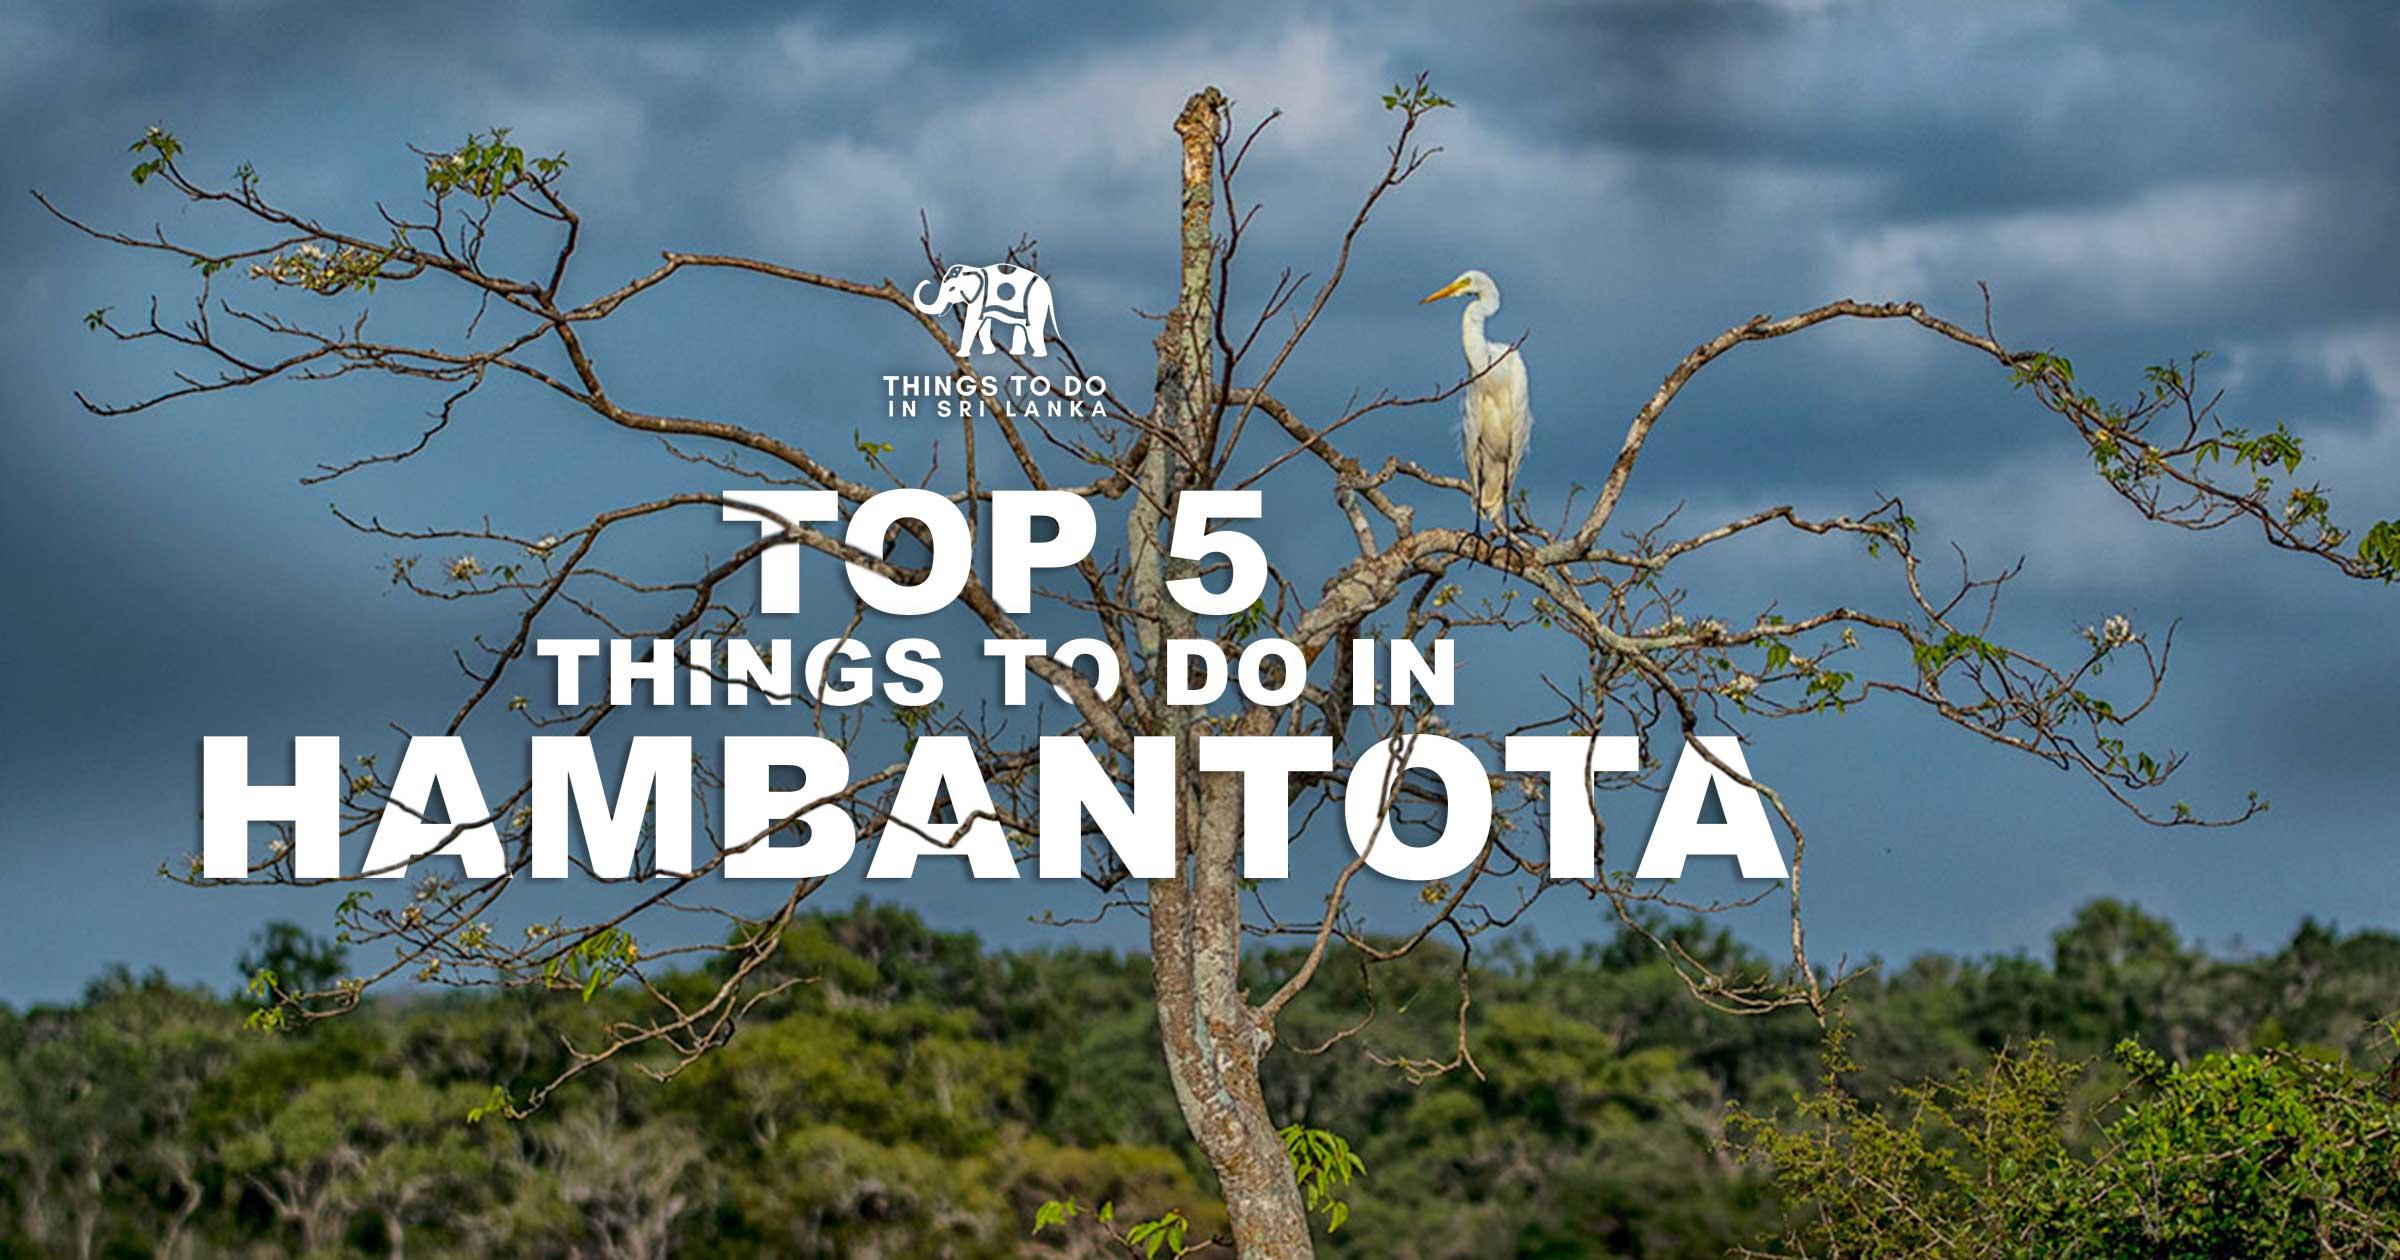 Top 5 things to do in Hambantota